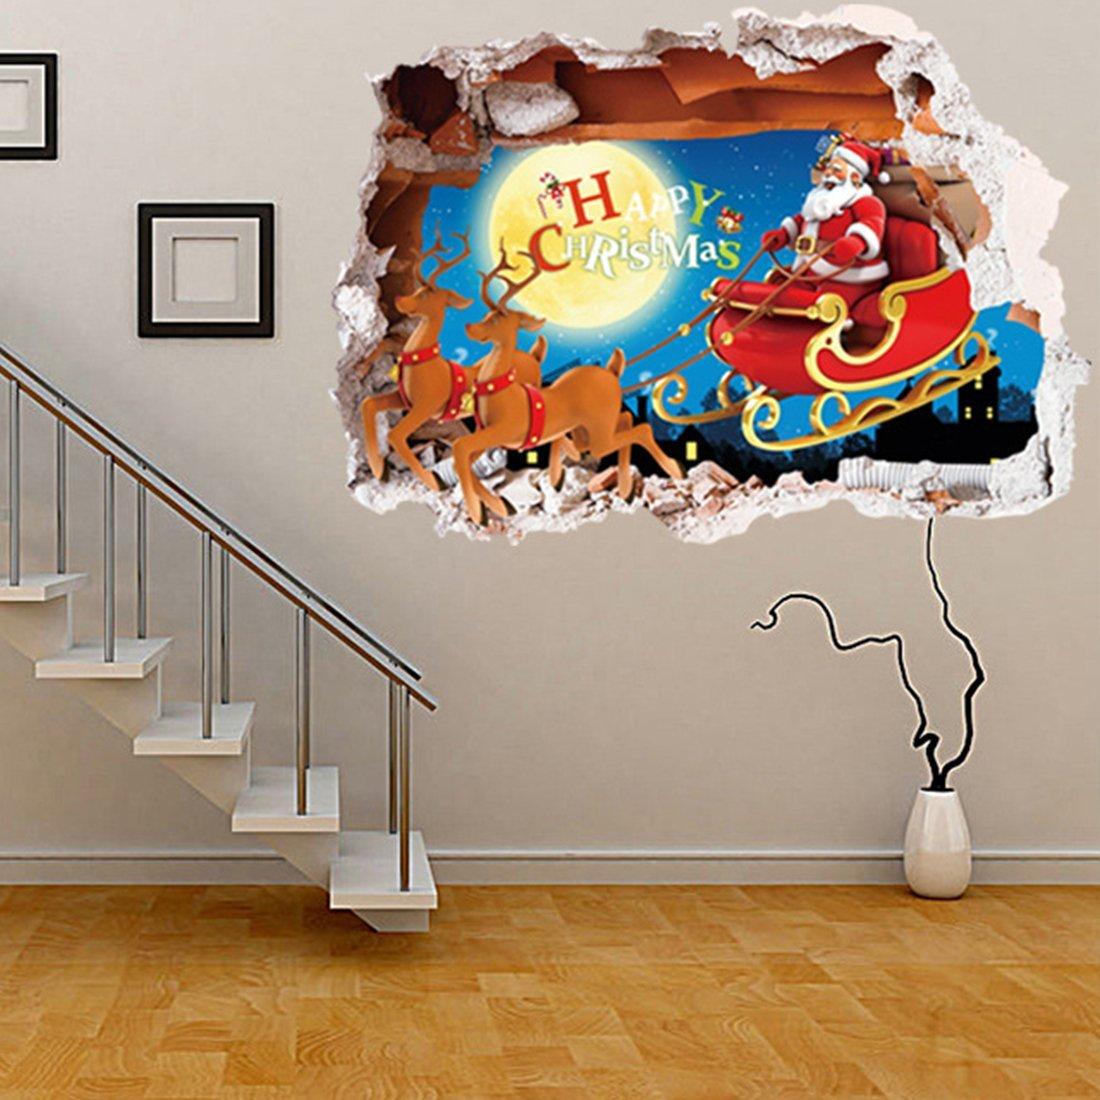 ArtWall Kathy Yatess Santa Barbara Pier at Sunset Appeelz Removable Graphic Wall Art 14 by 18